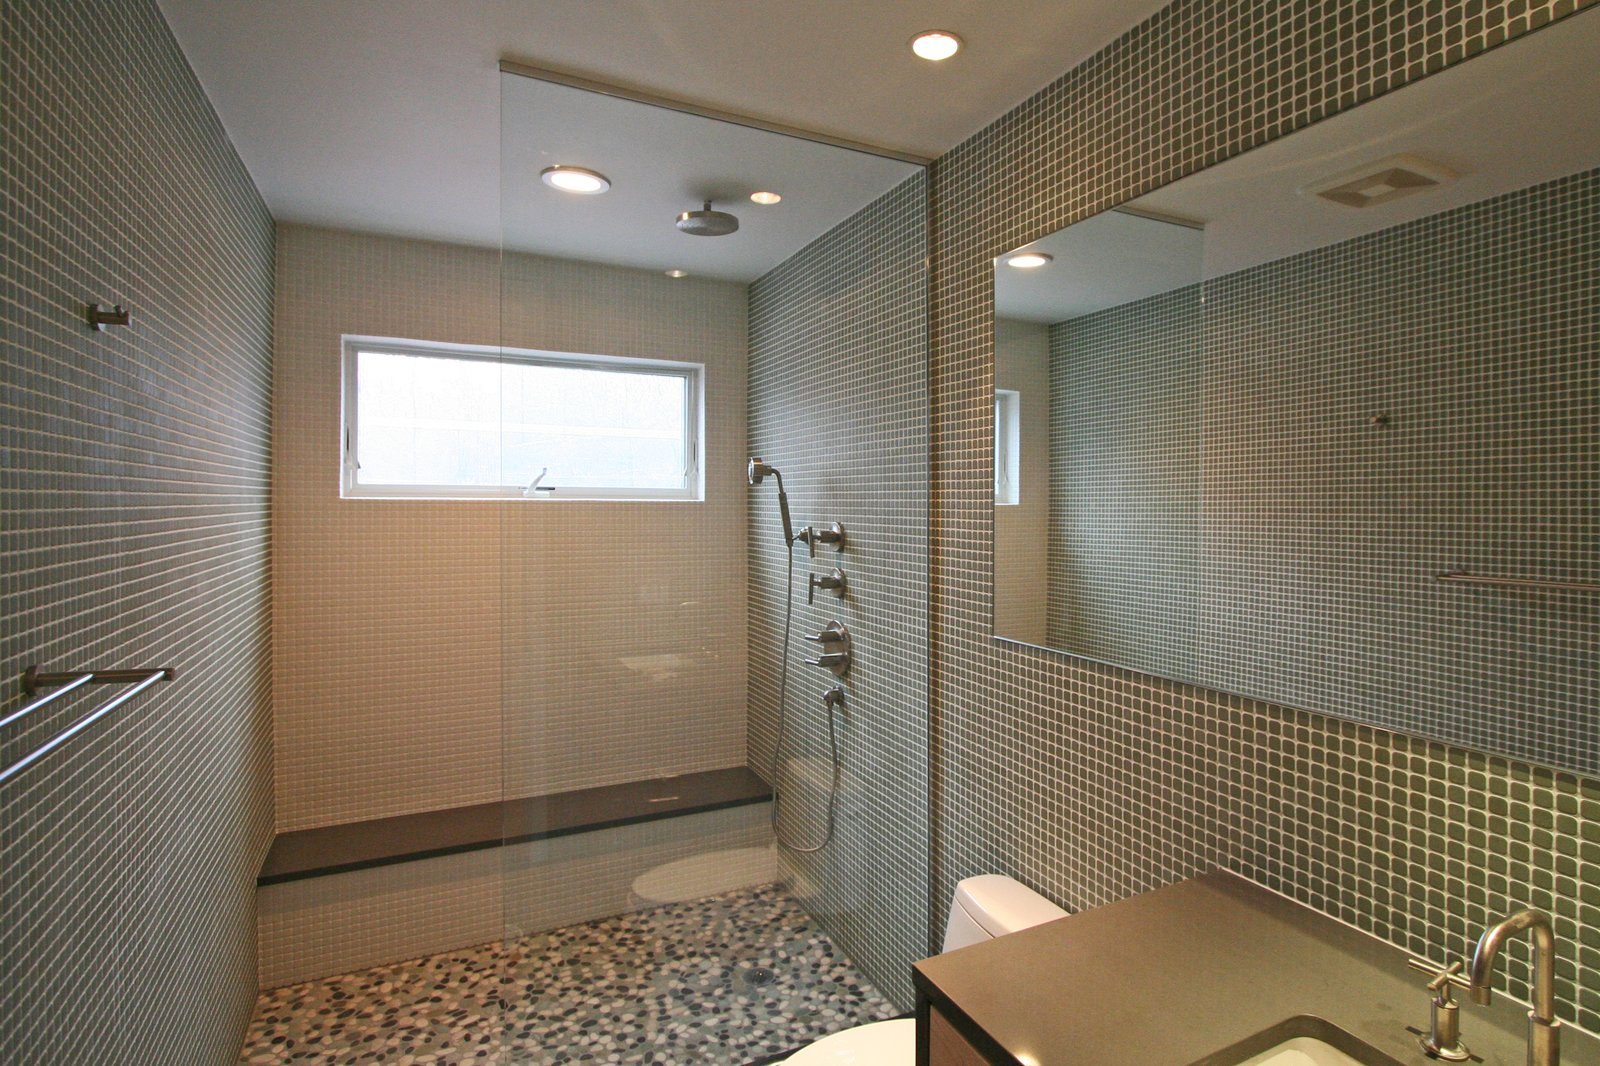 Bath Room Bathroom  Catskills Suburban by Resolution: 4 Architecture